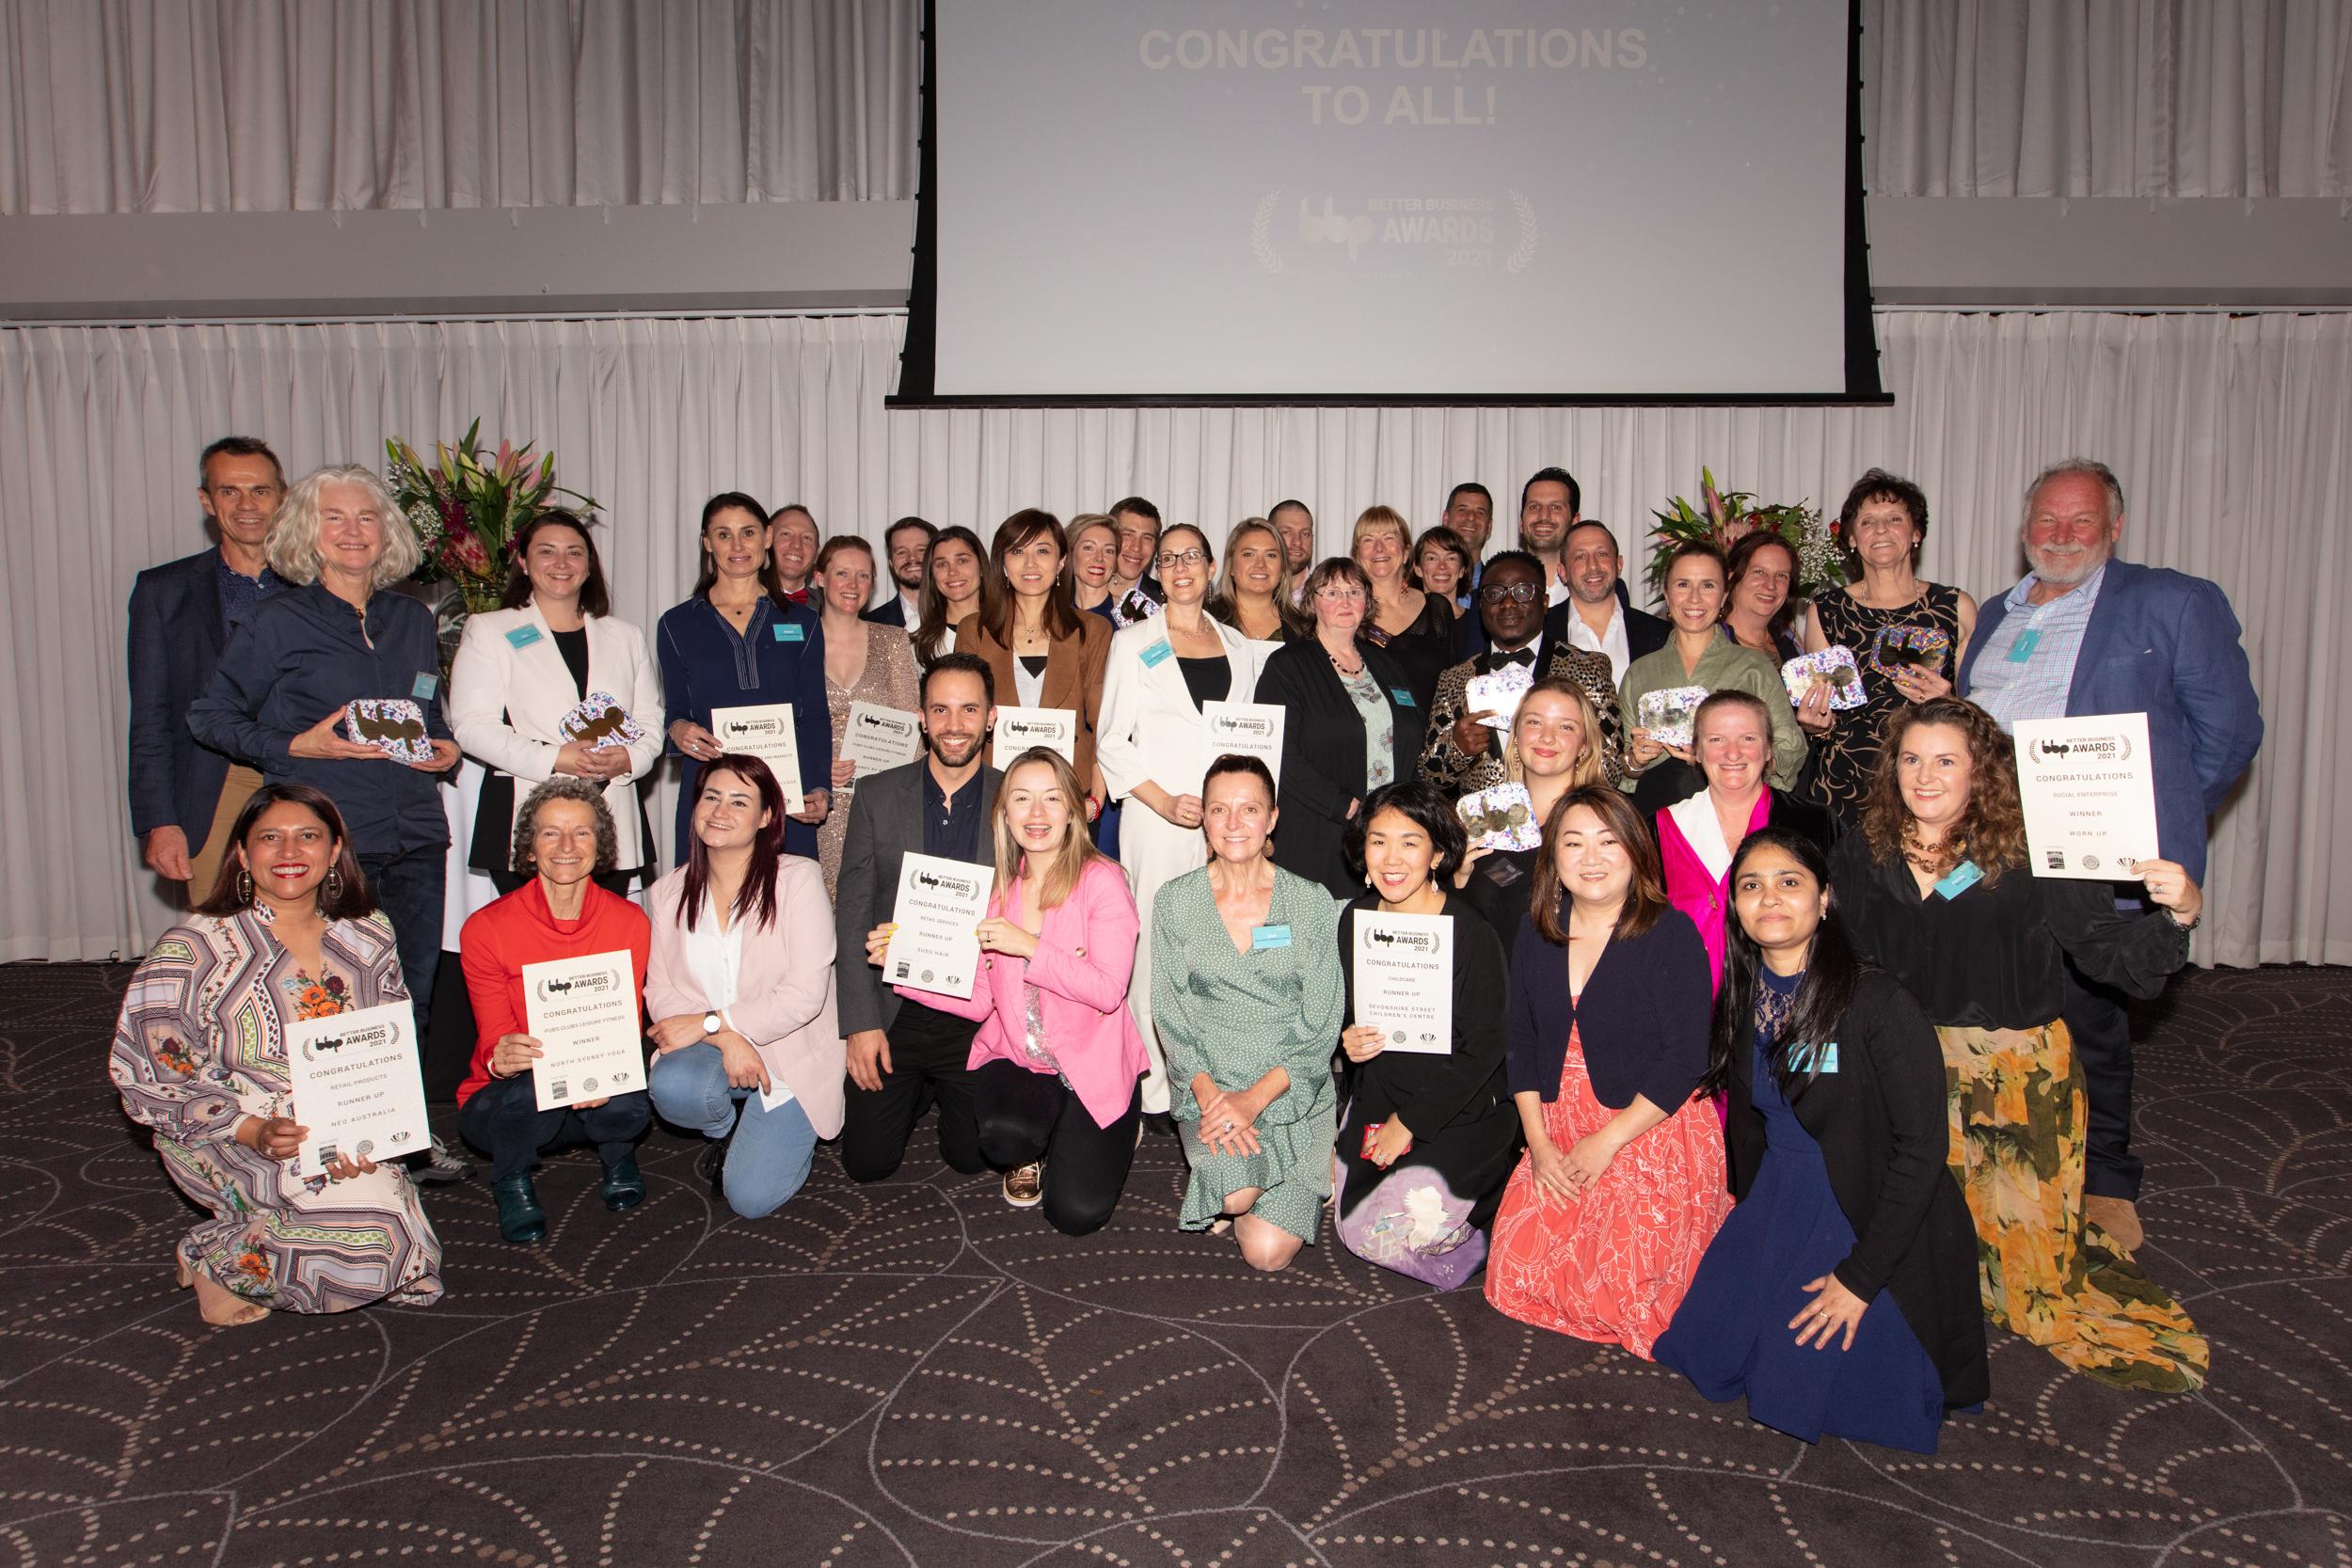 Better Business Awards 2021 Winners Announced